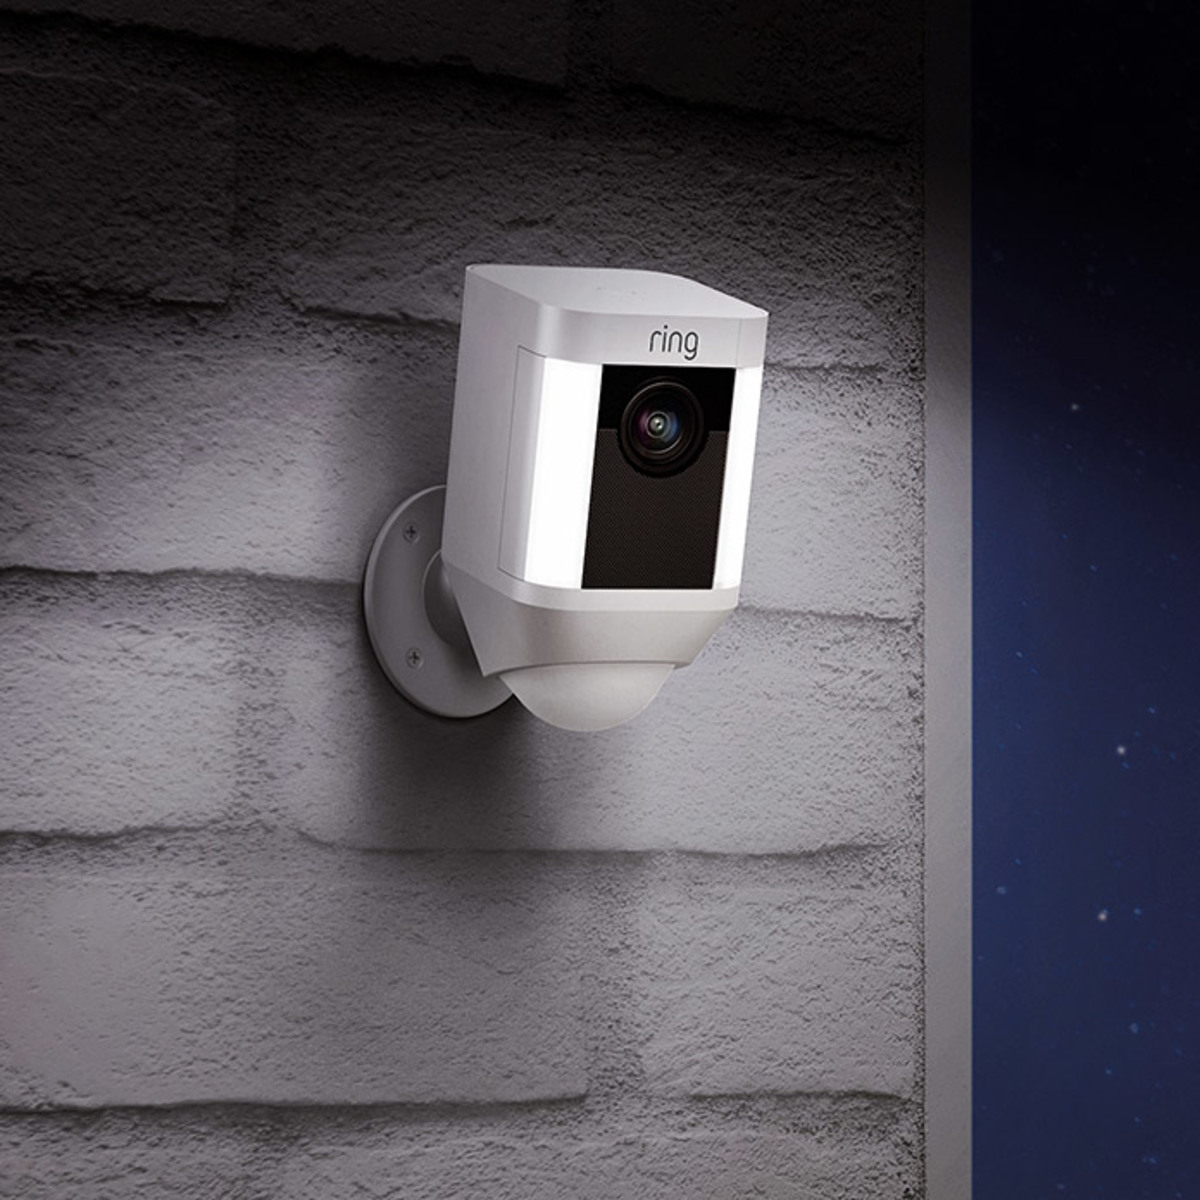 Bild 4 von Ring WLAN-Netzwerkkamera Spotlight Cam Battery